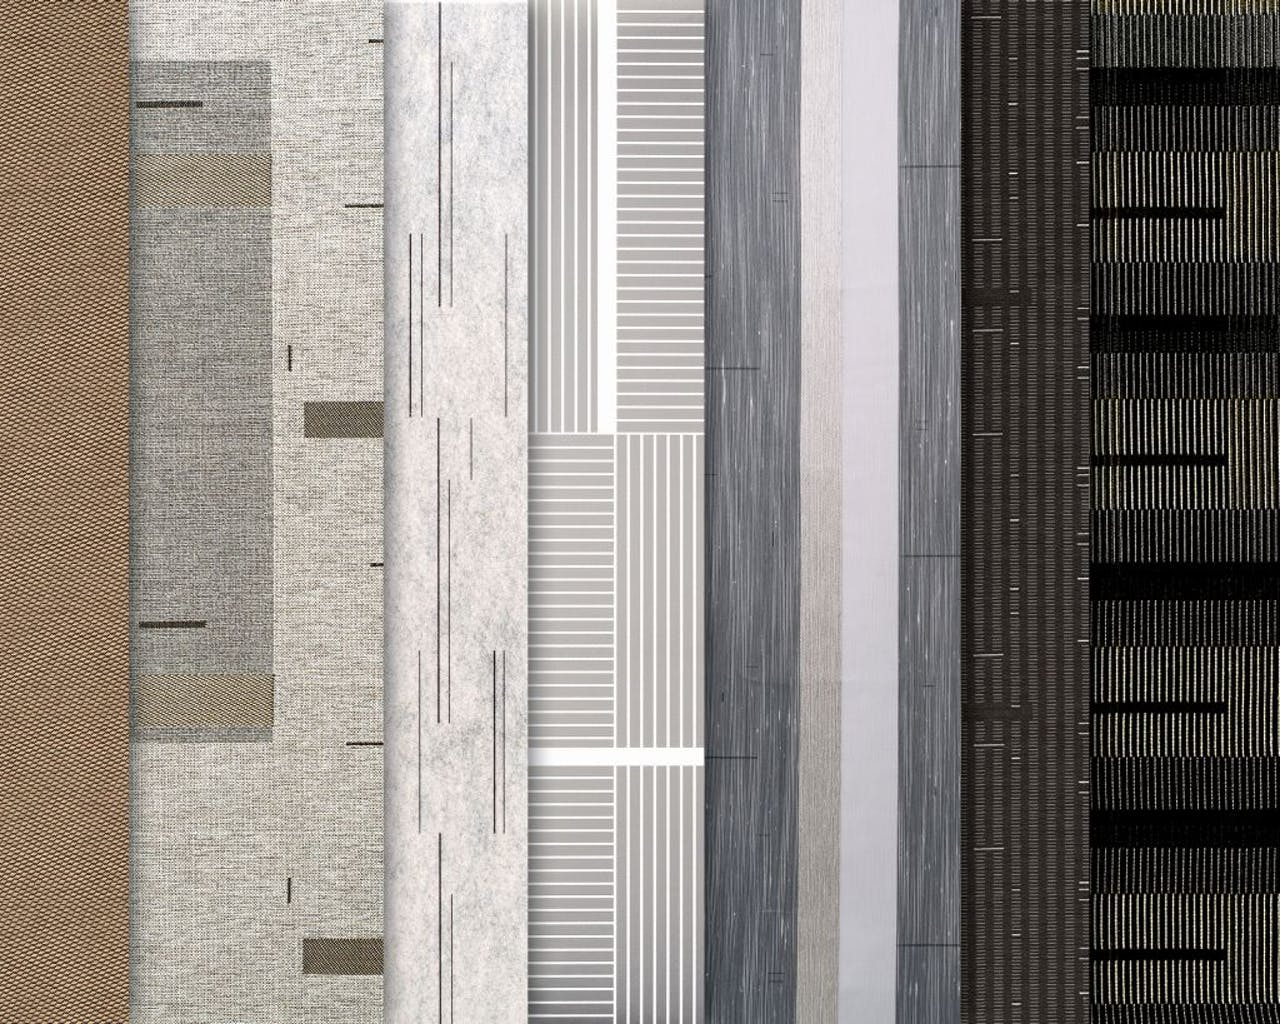 De meubel-stoffen, gordijnen en wall coverings die Engelgeer voor stoffenmerk Wolf Gordon ontwierp.